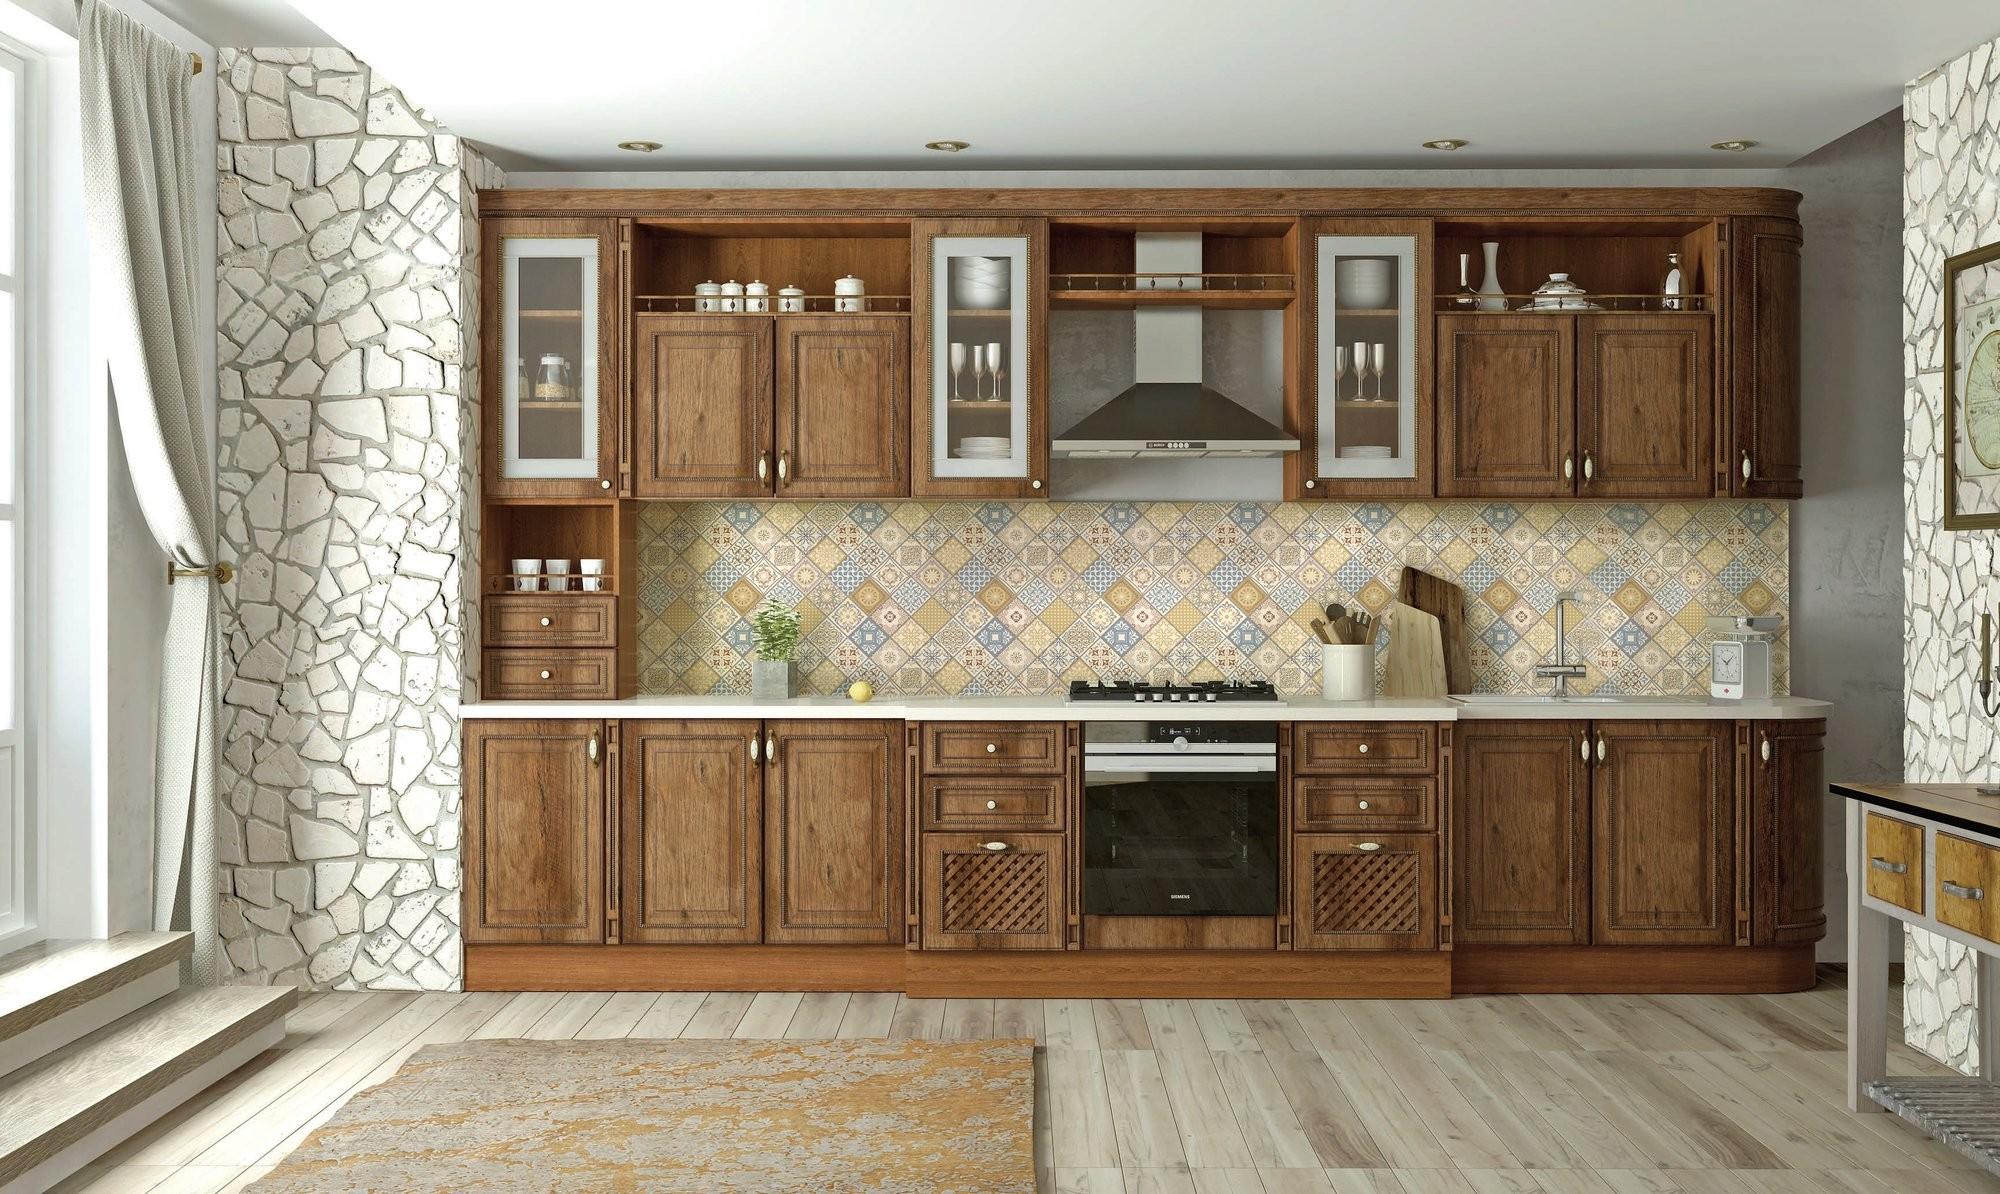 полотно фабрика аризона во владивостоке фото мебели кухни побывав